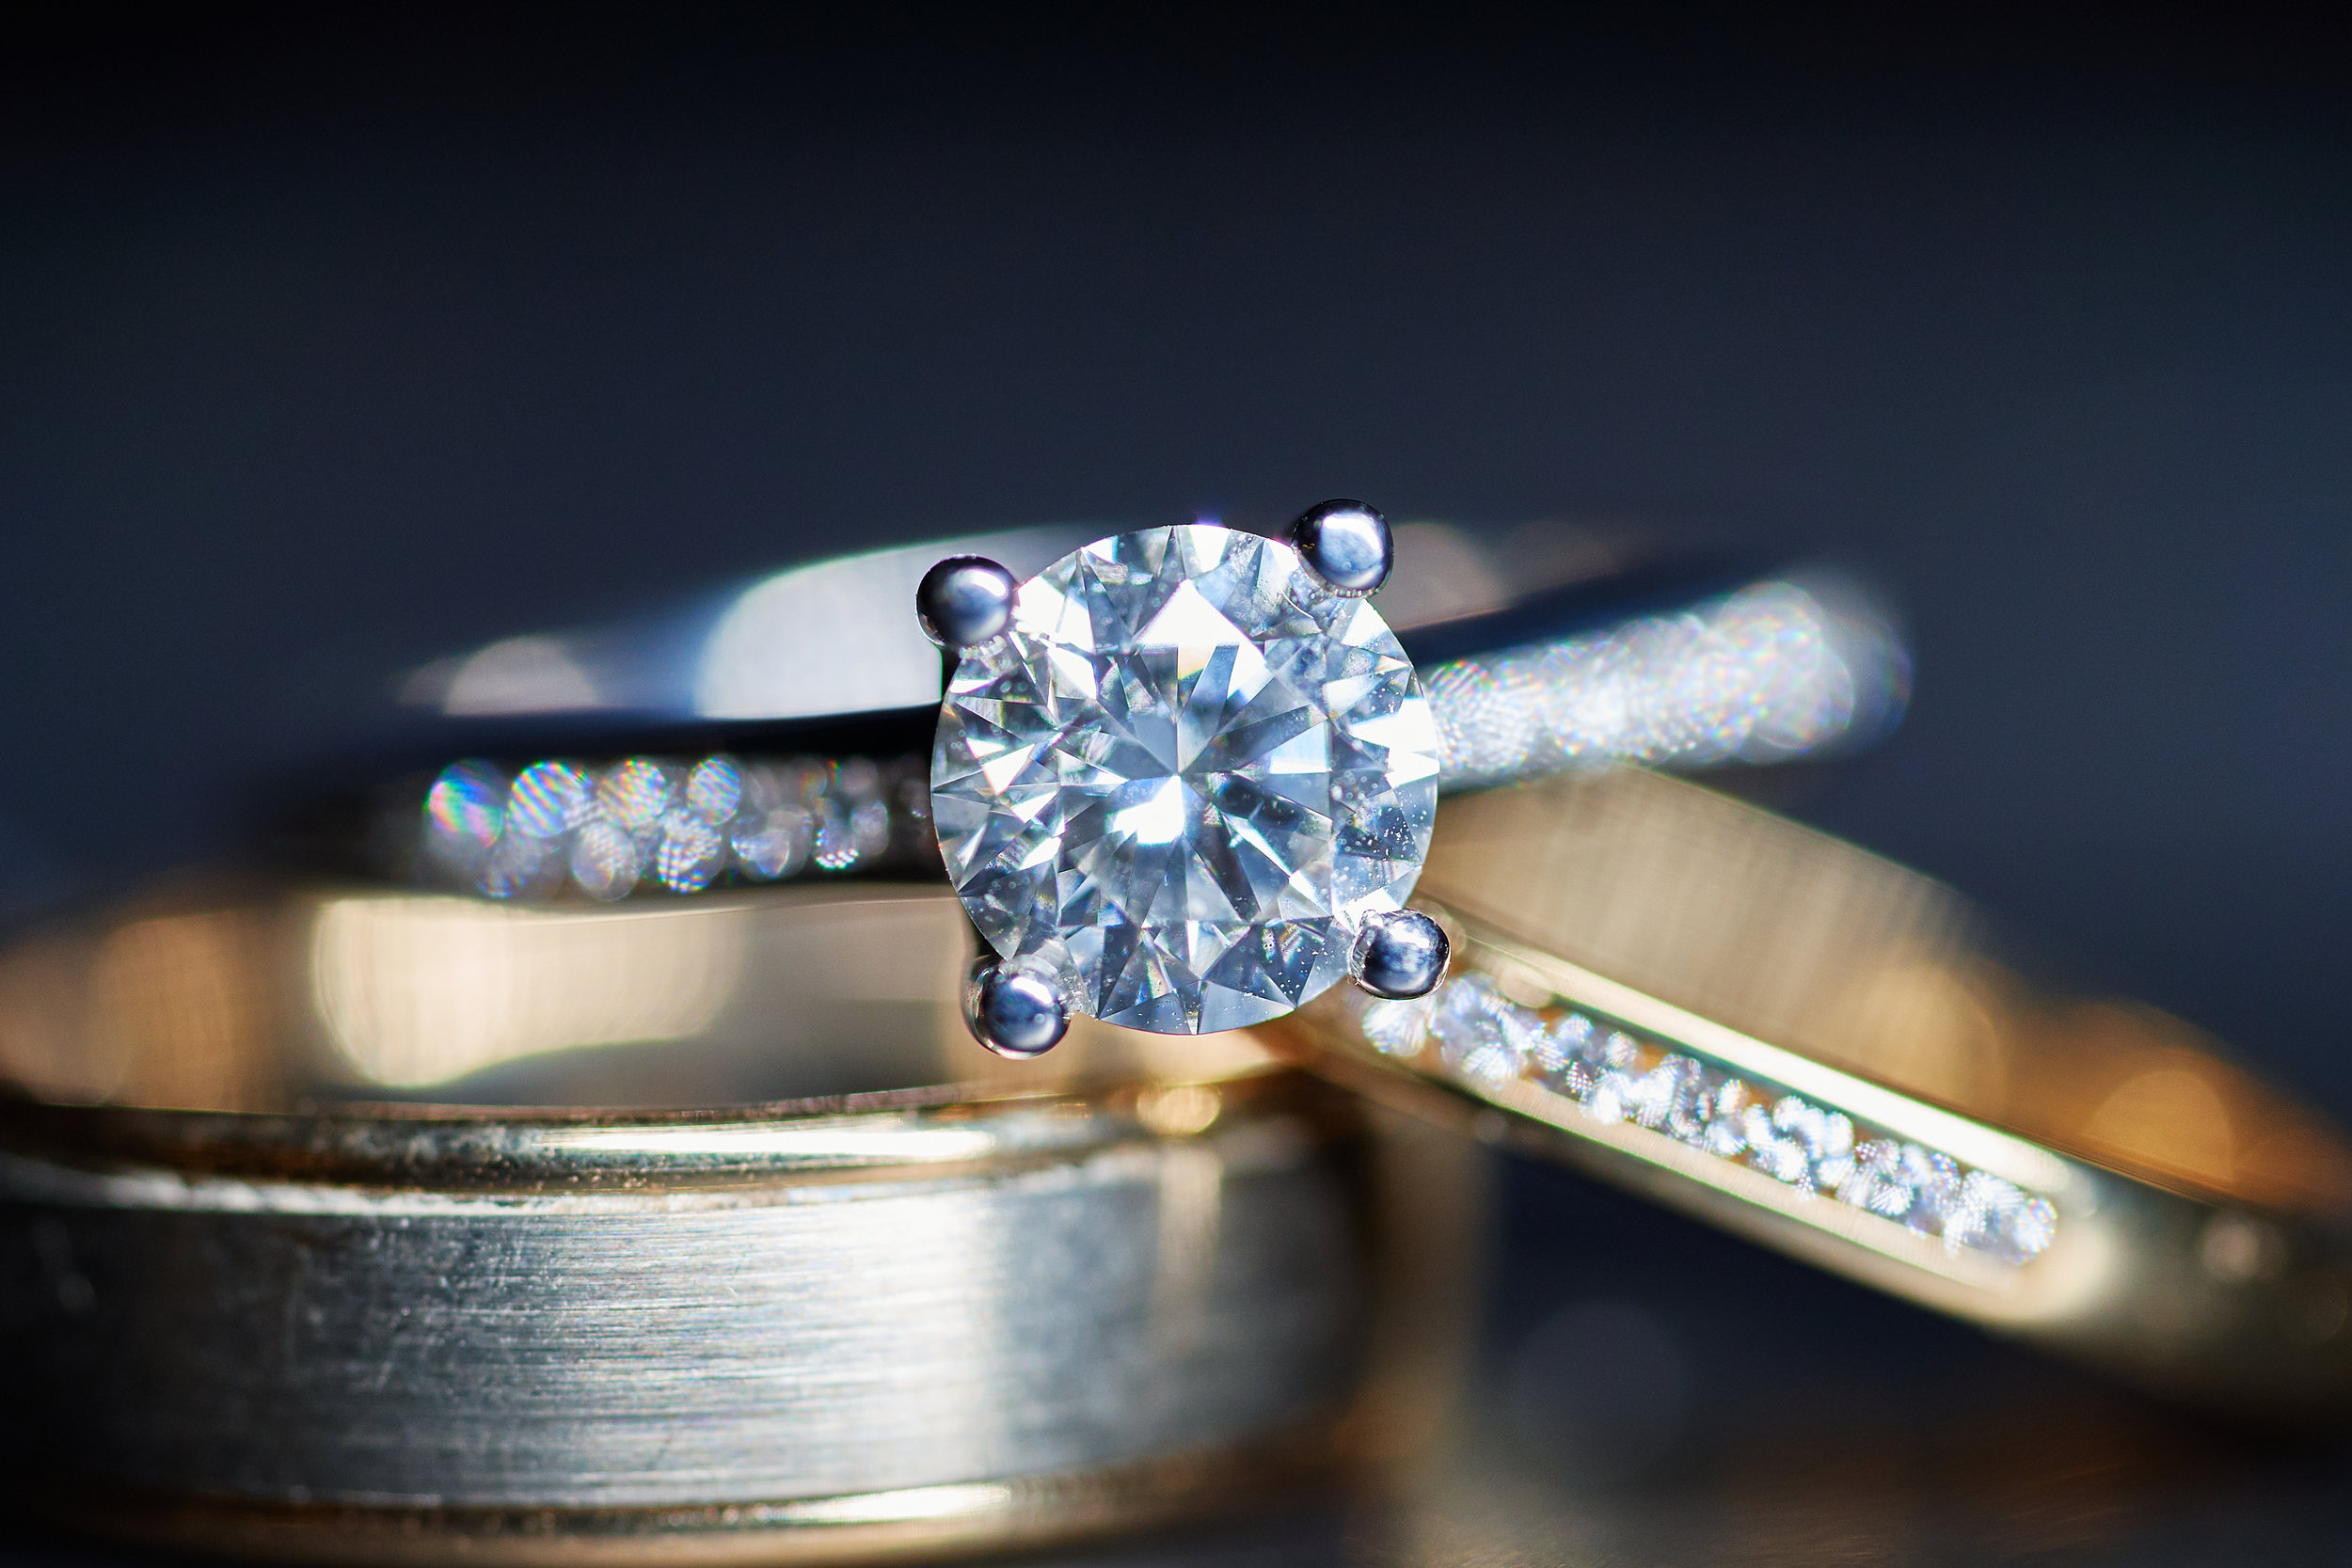 The obligatory macro shot of the Bride and Groom's rings! [Sony A7III 90mm 2.8 Macro]